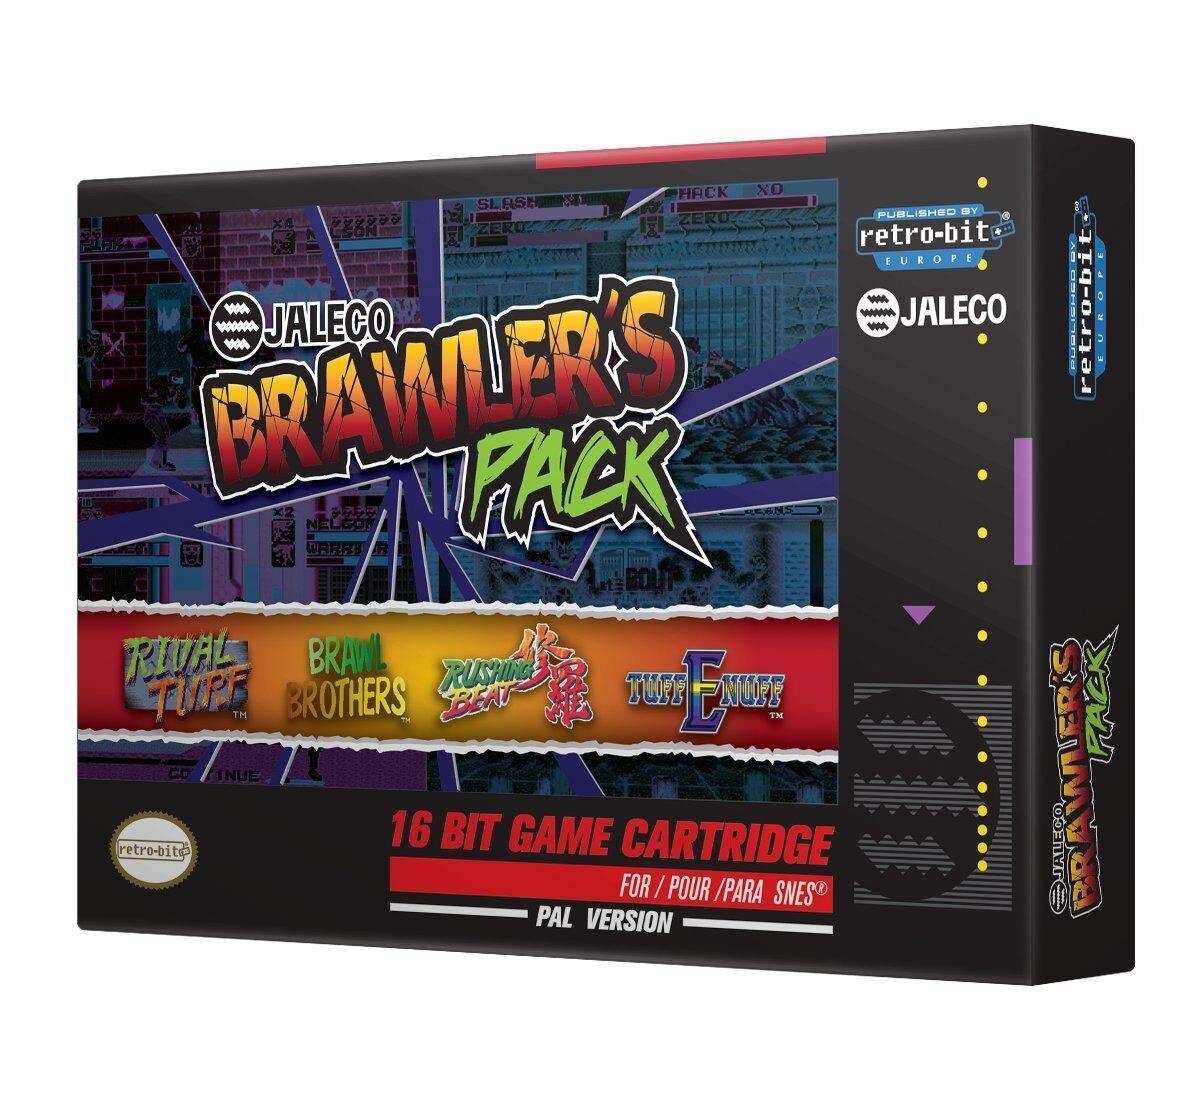 Pack Retro-Bit Jaleco Brawlers Super Nintendo pour SNES